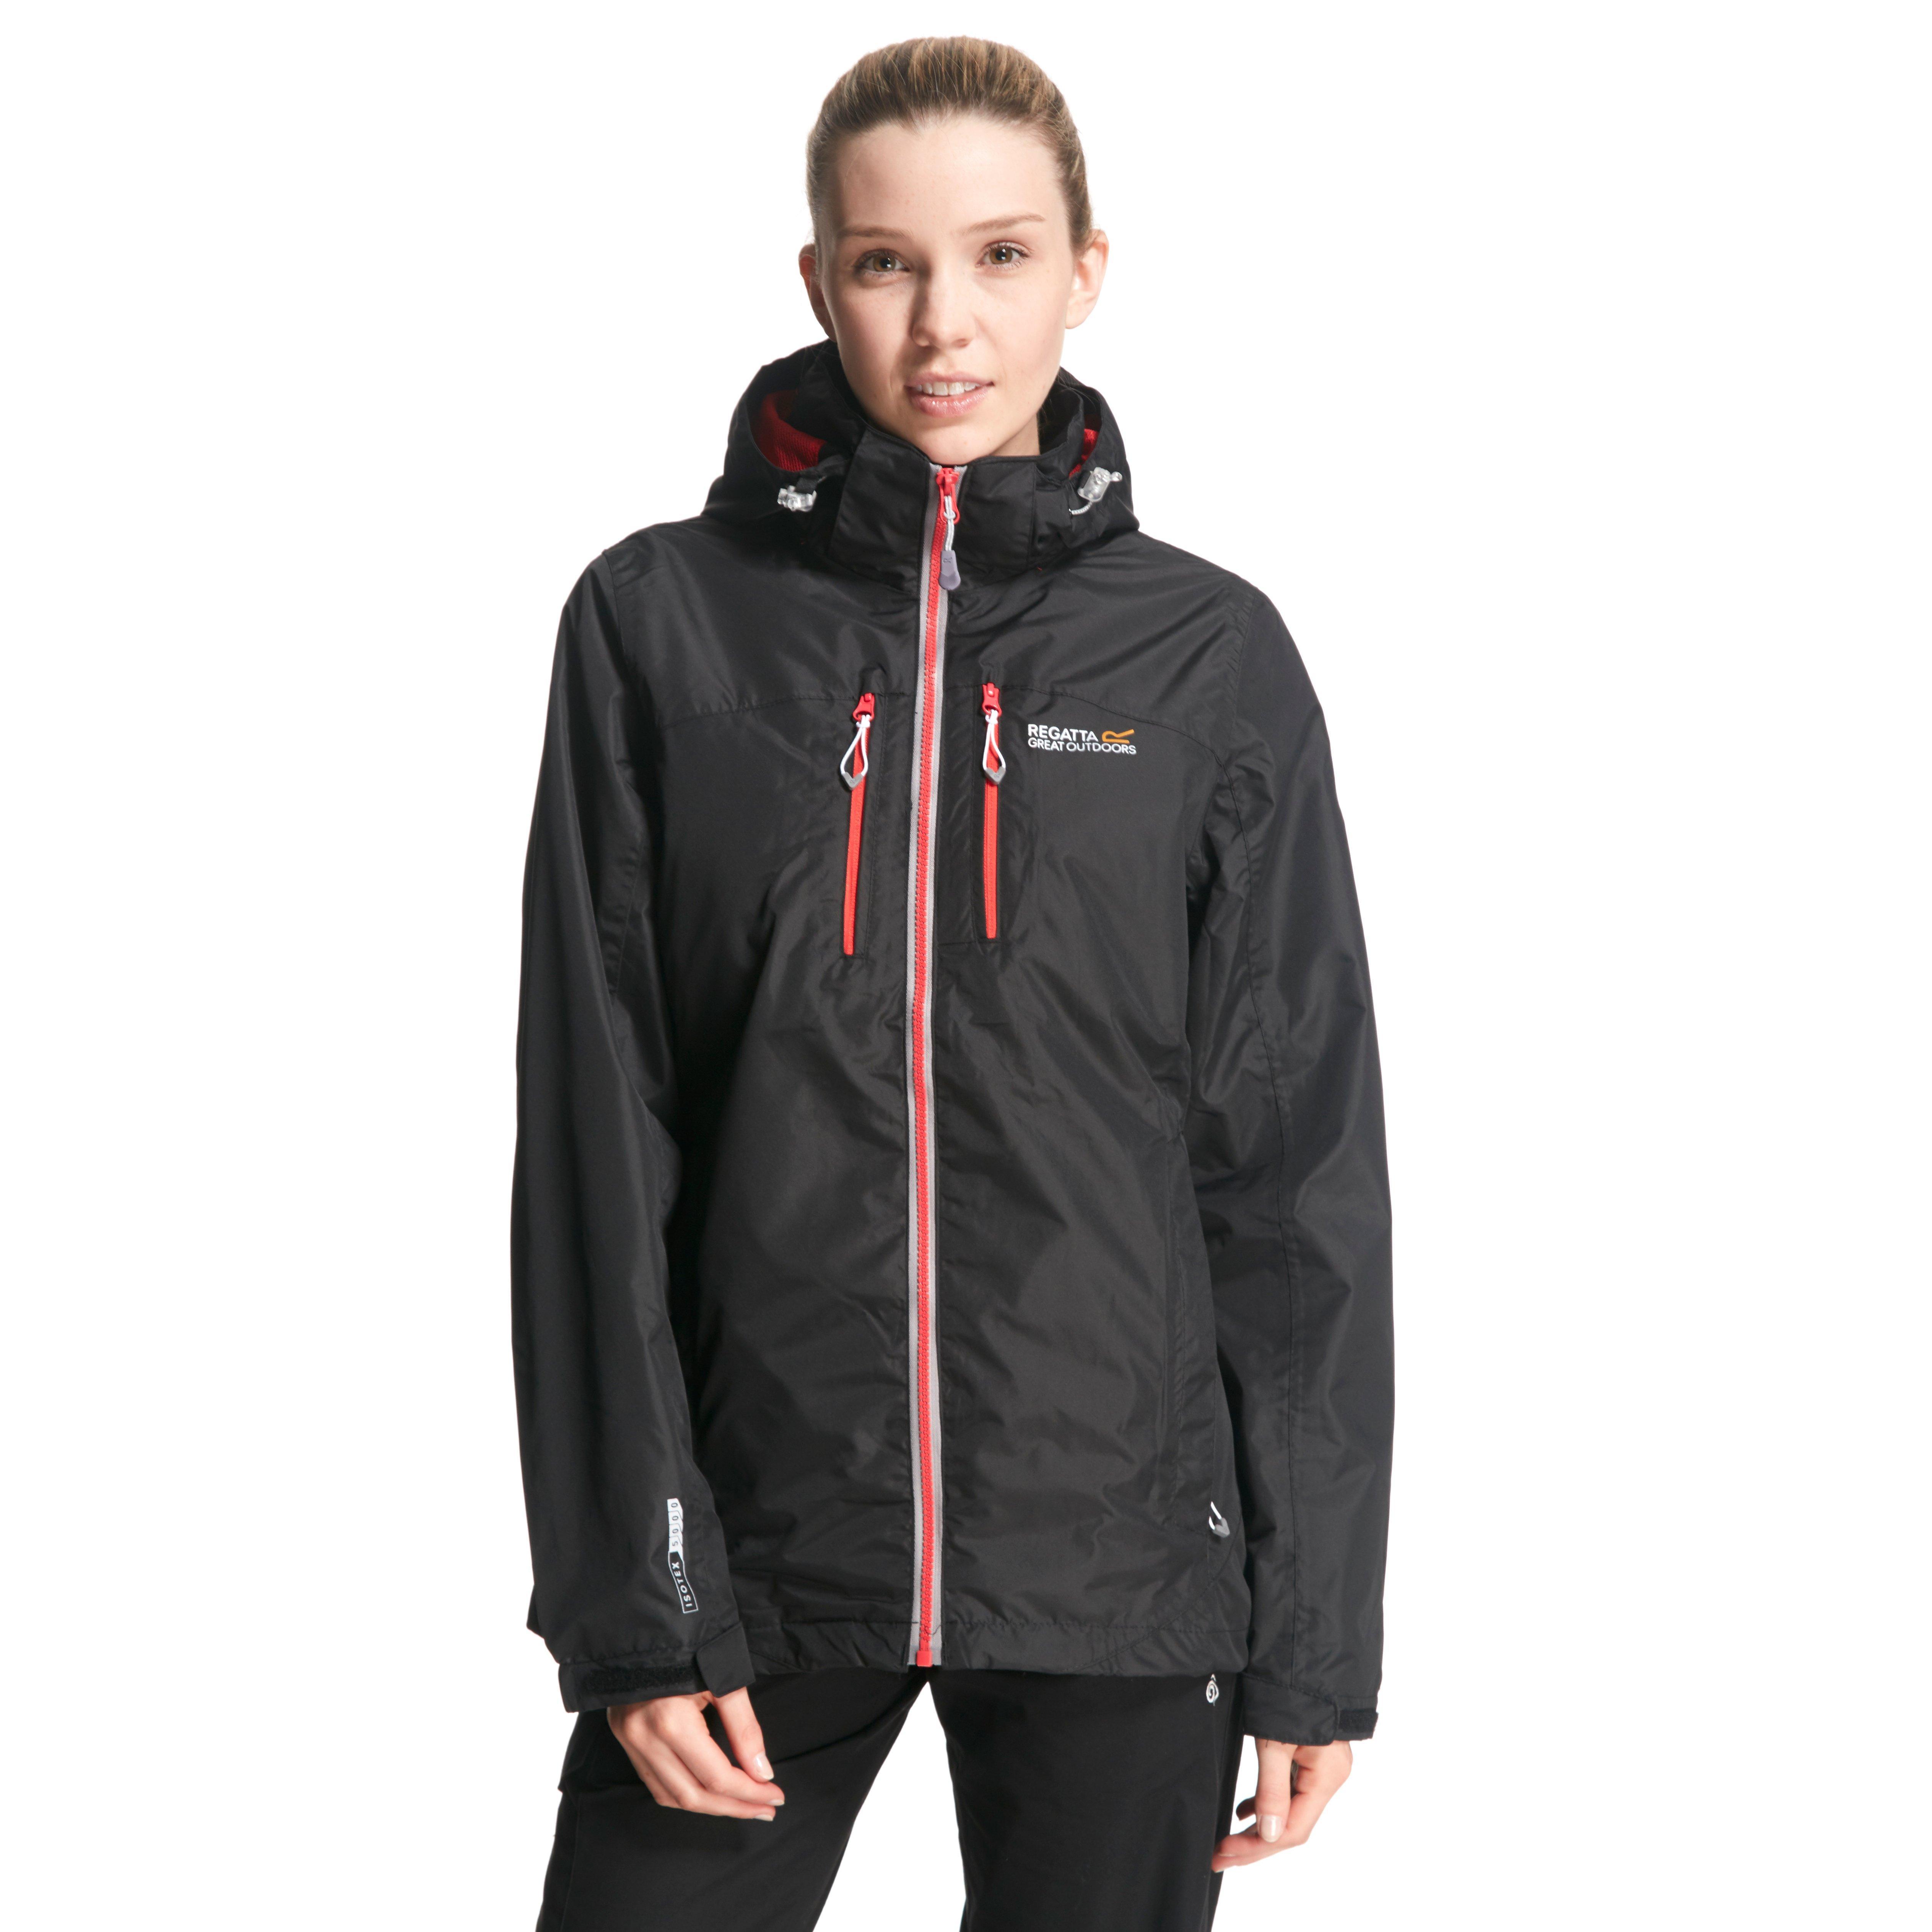 Regatta Womens Calderdale Jacket Black